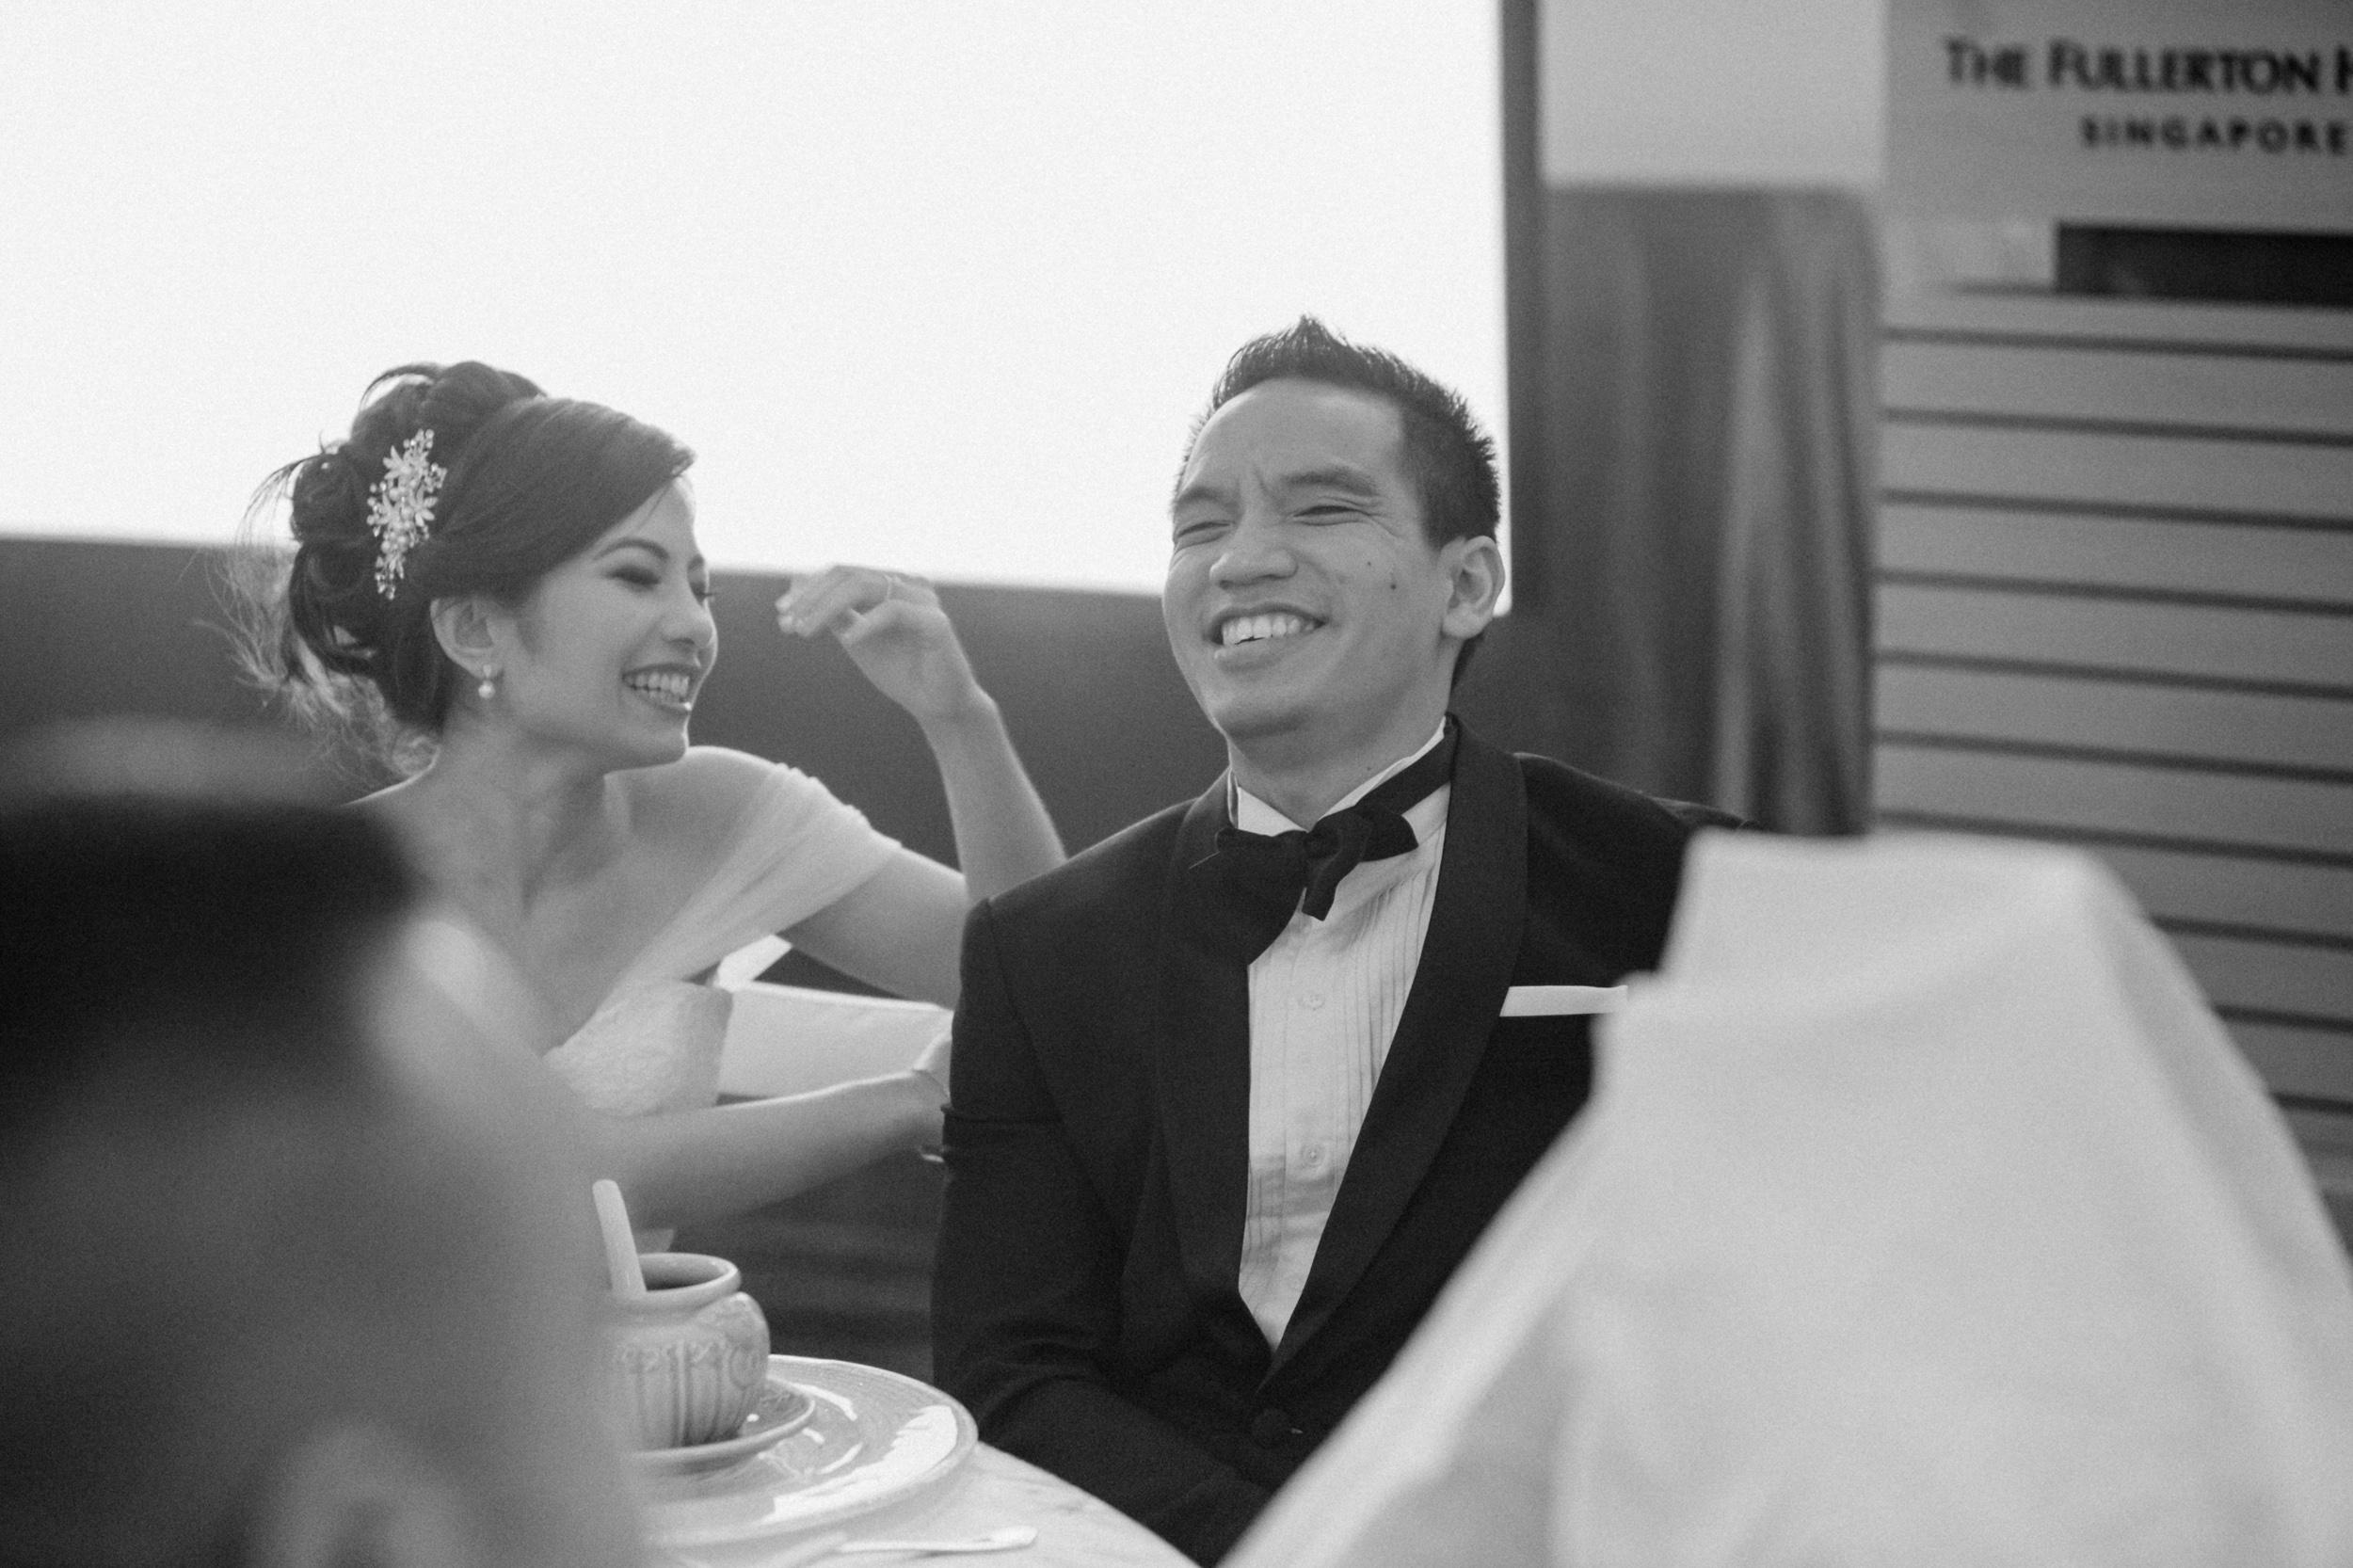 singapore-wedding-photographer-cheryl-matthew-fullerton-hotel-wedding-62.jpg